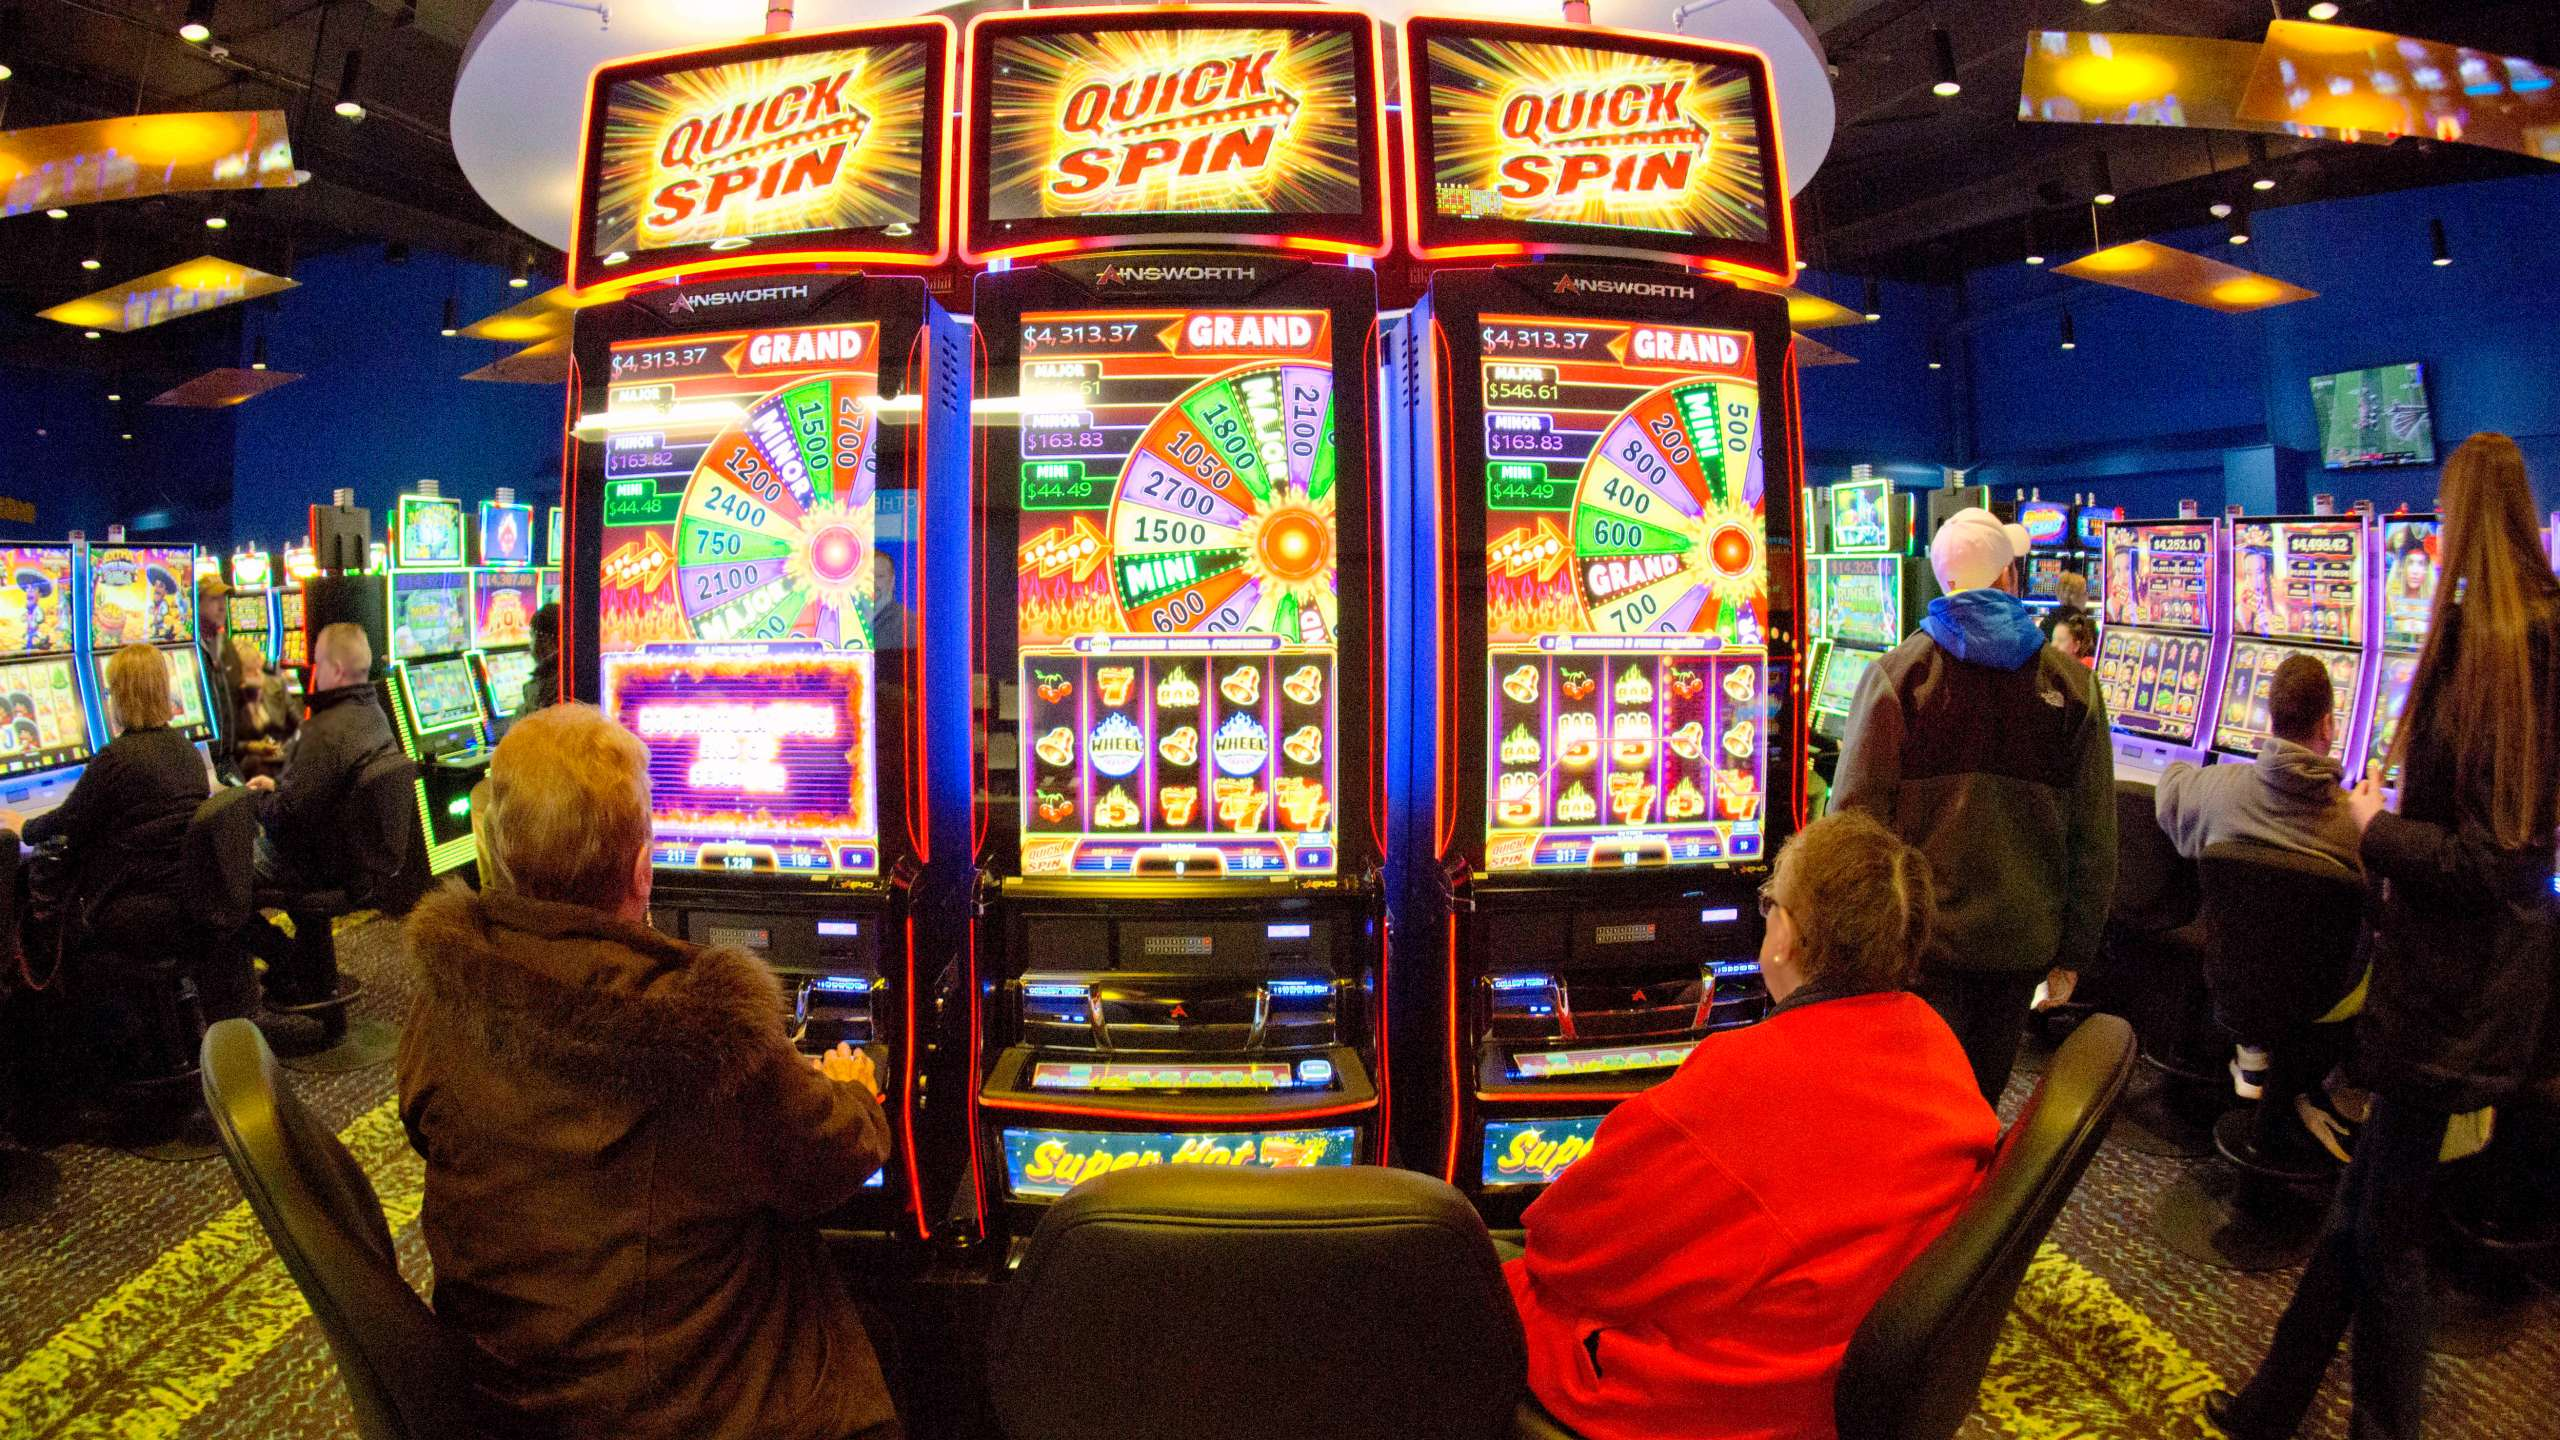 Tribal_Casino_Fight_75826-159532.jpg66926950